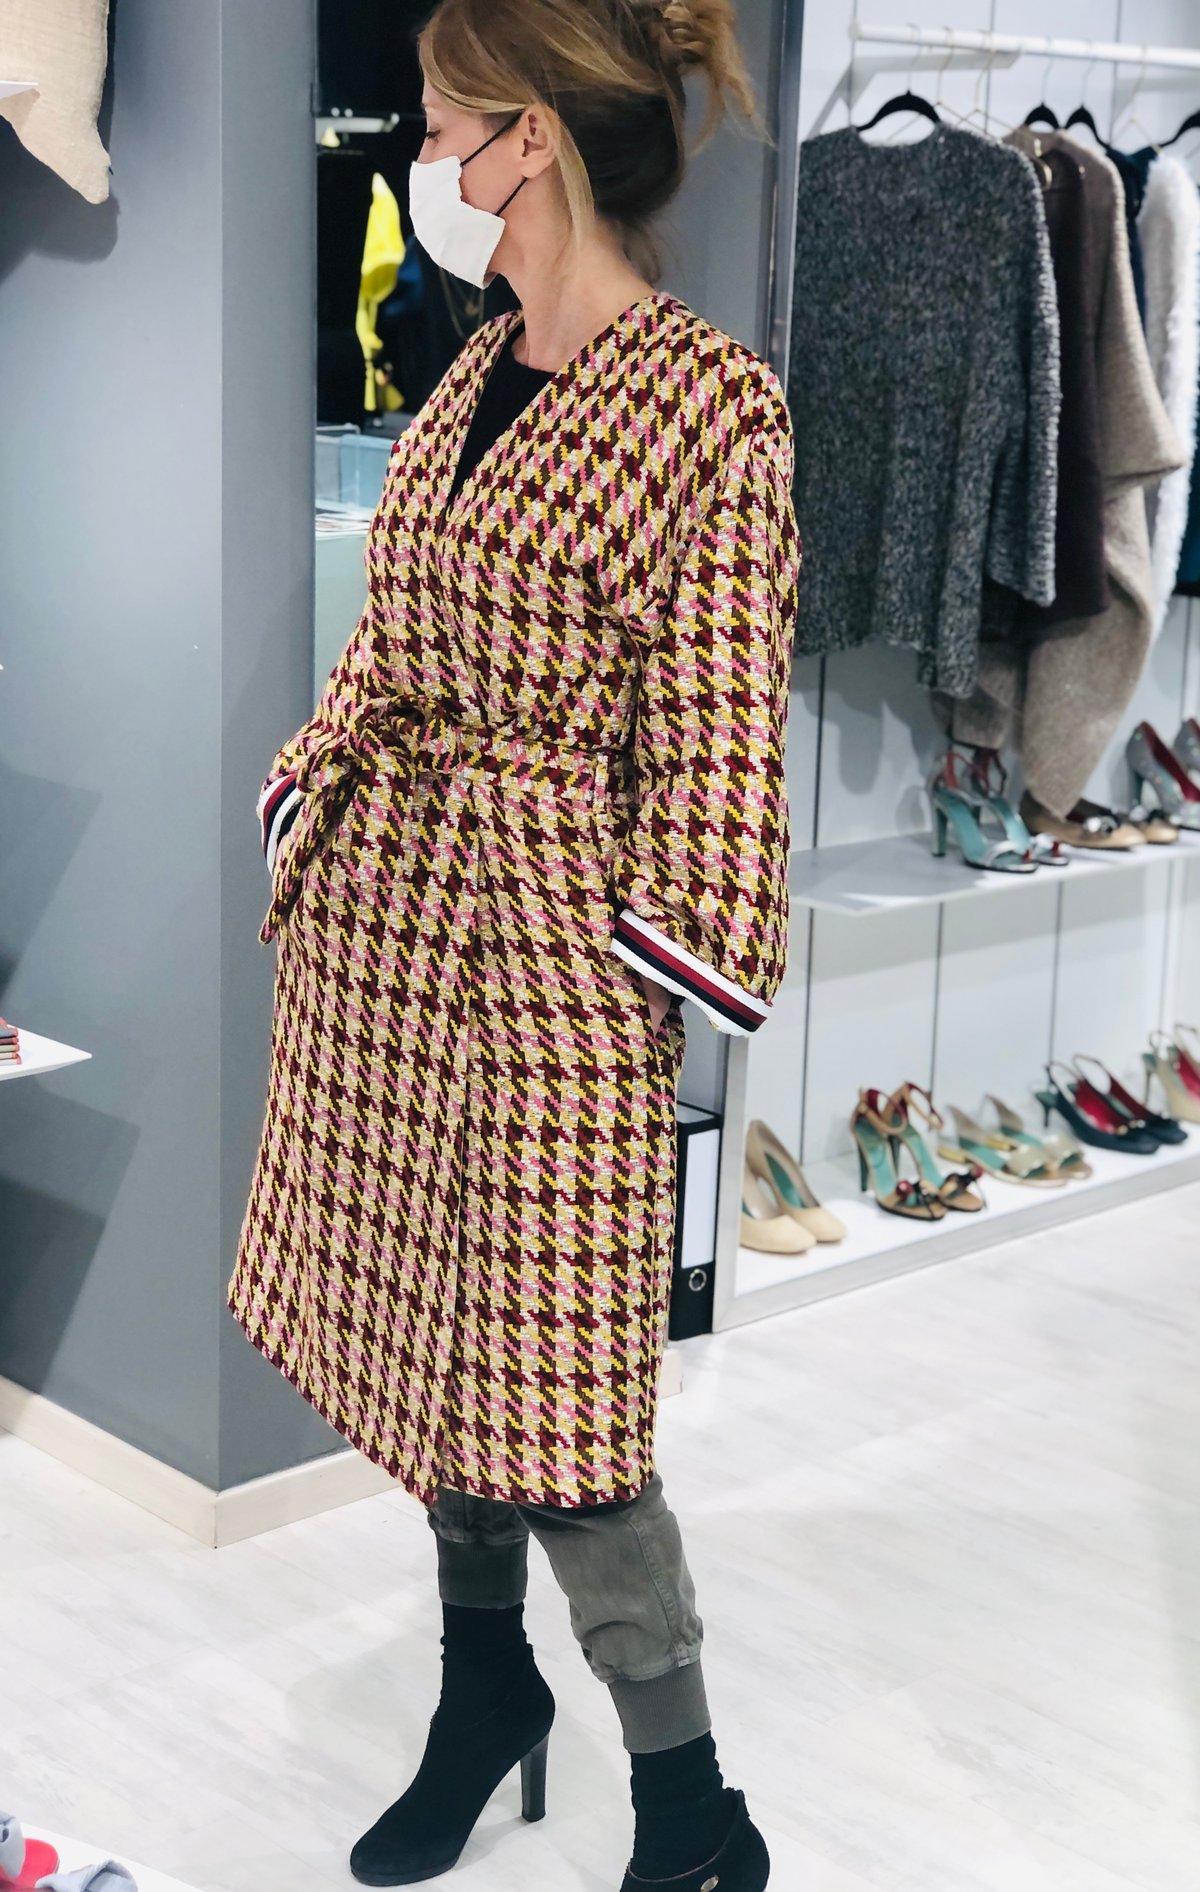 Image of Kimono Jacquard 2